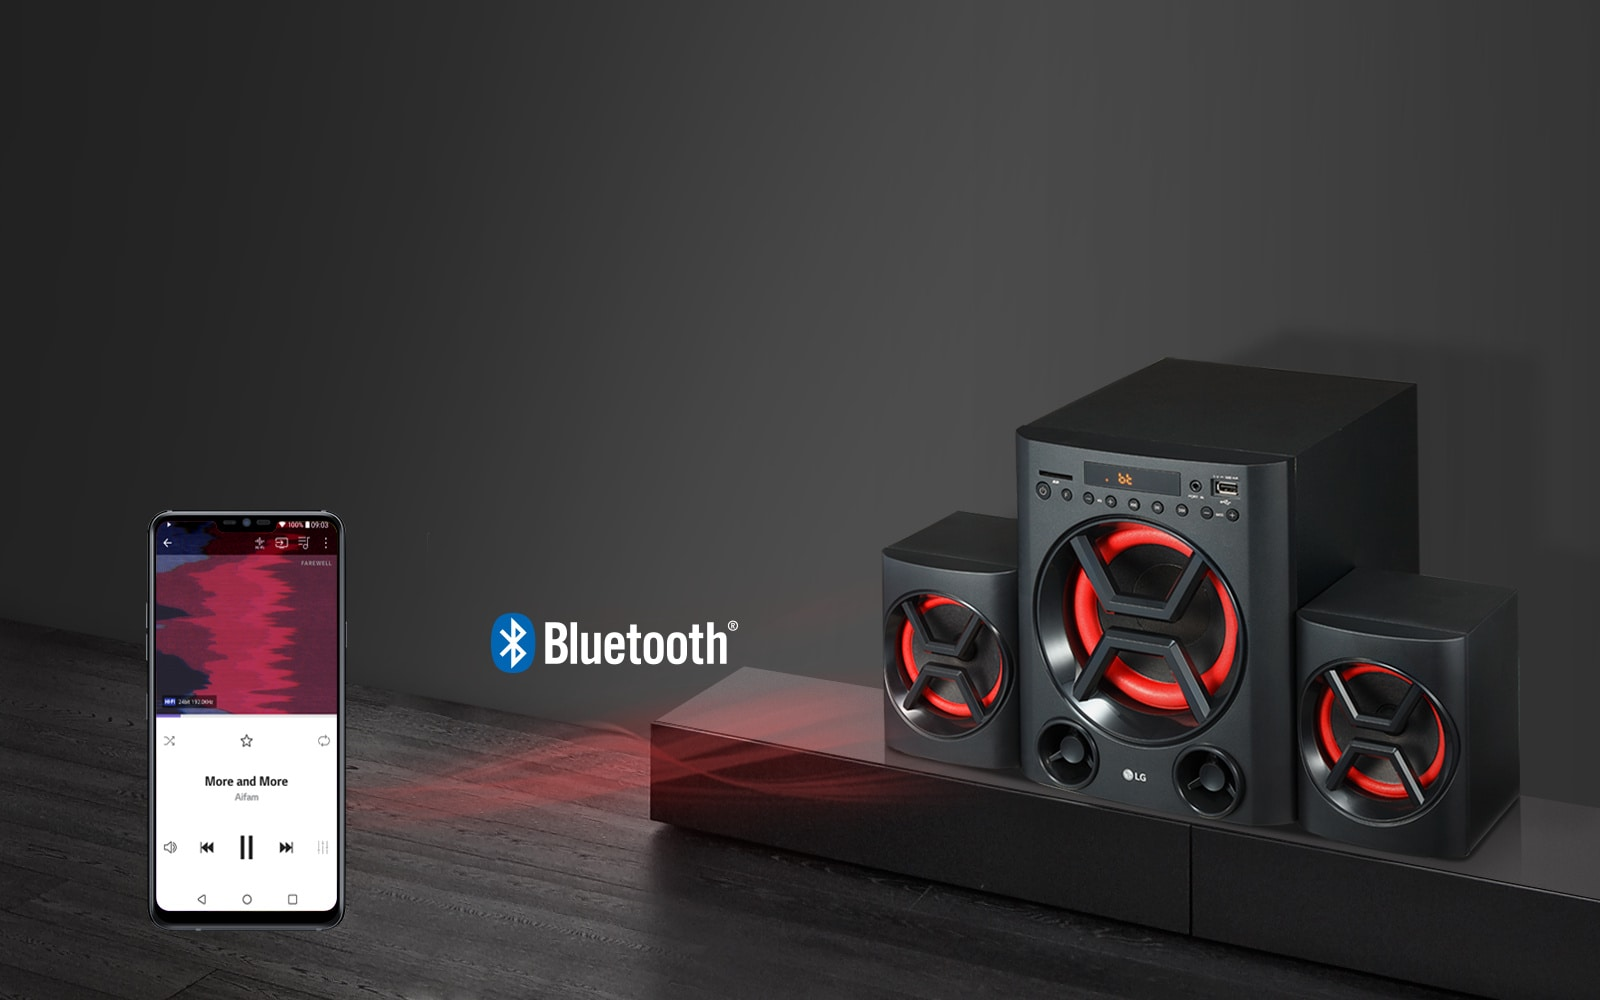 Wireless Audio Streaming via Bluetooth<br>1